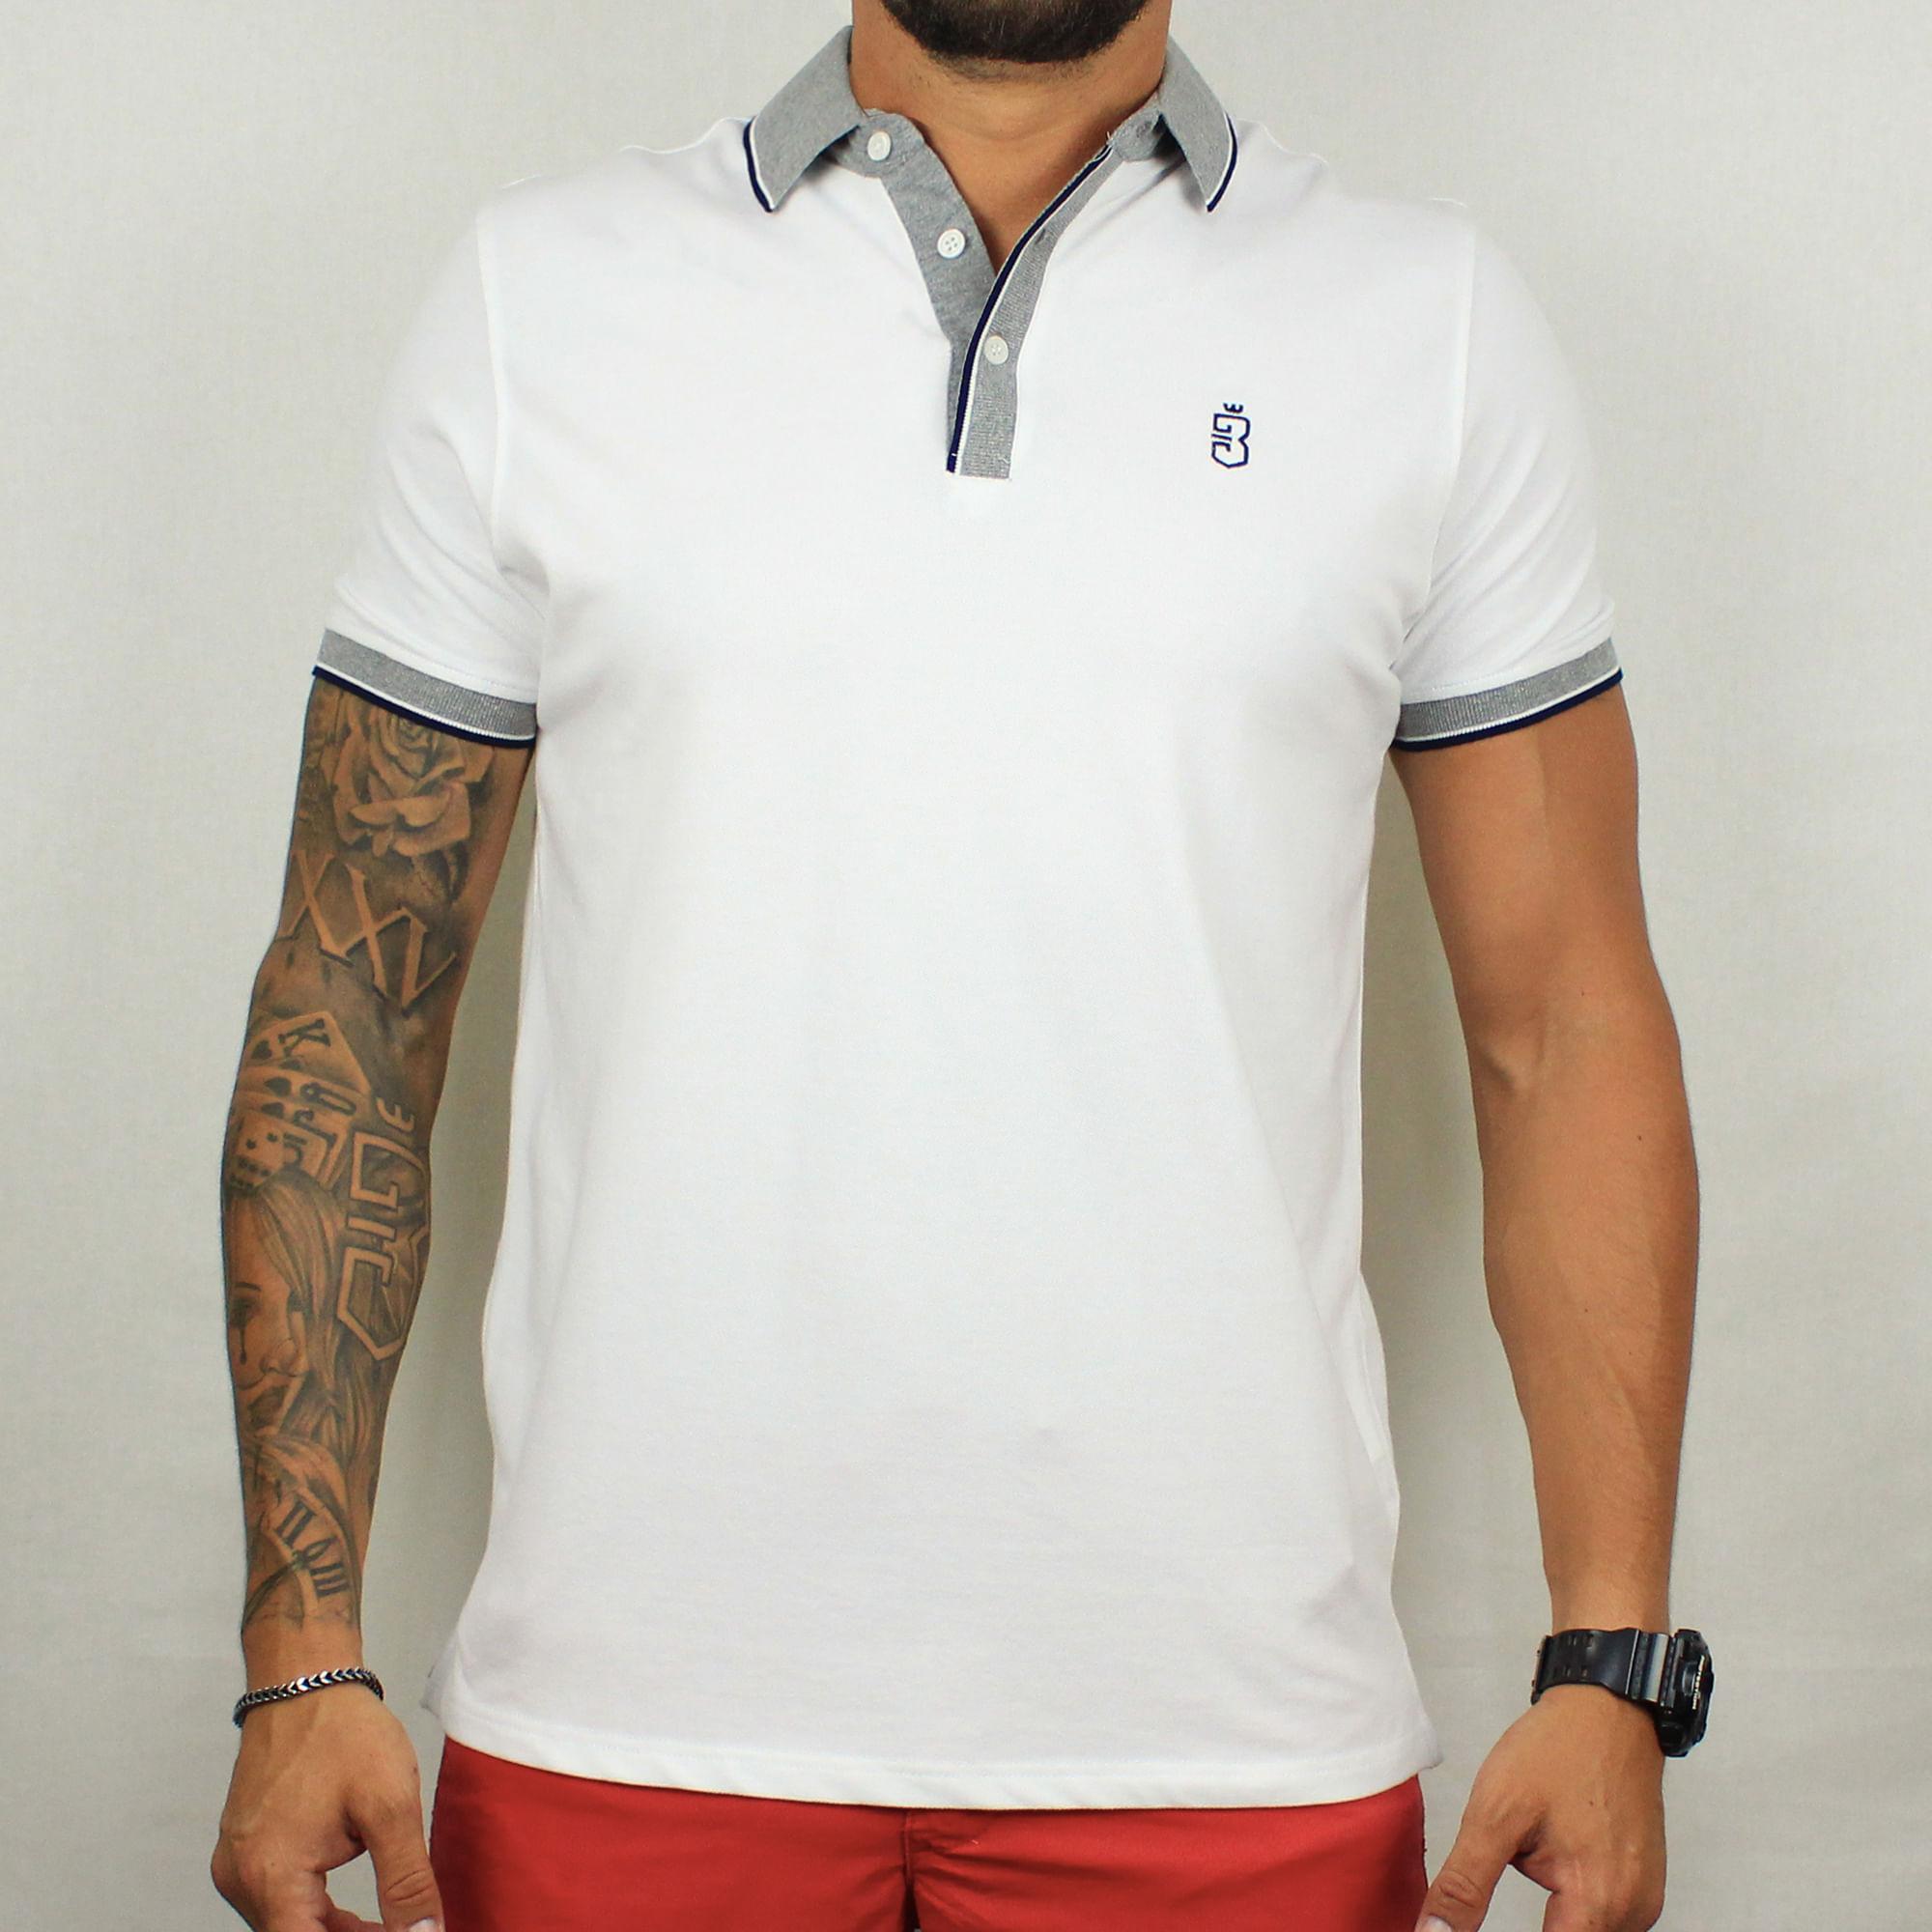 641d49b70 Camisa Polo Branca 338  Camisa Polo Branca 338. Lista de Desejos. usebora ·  Masculino · Pólos